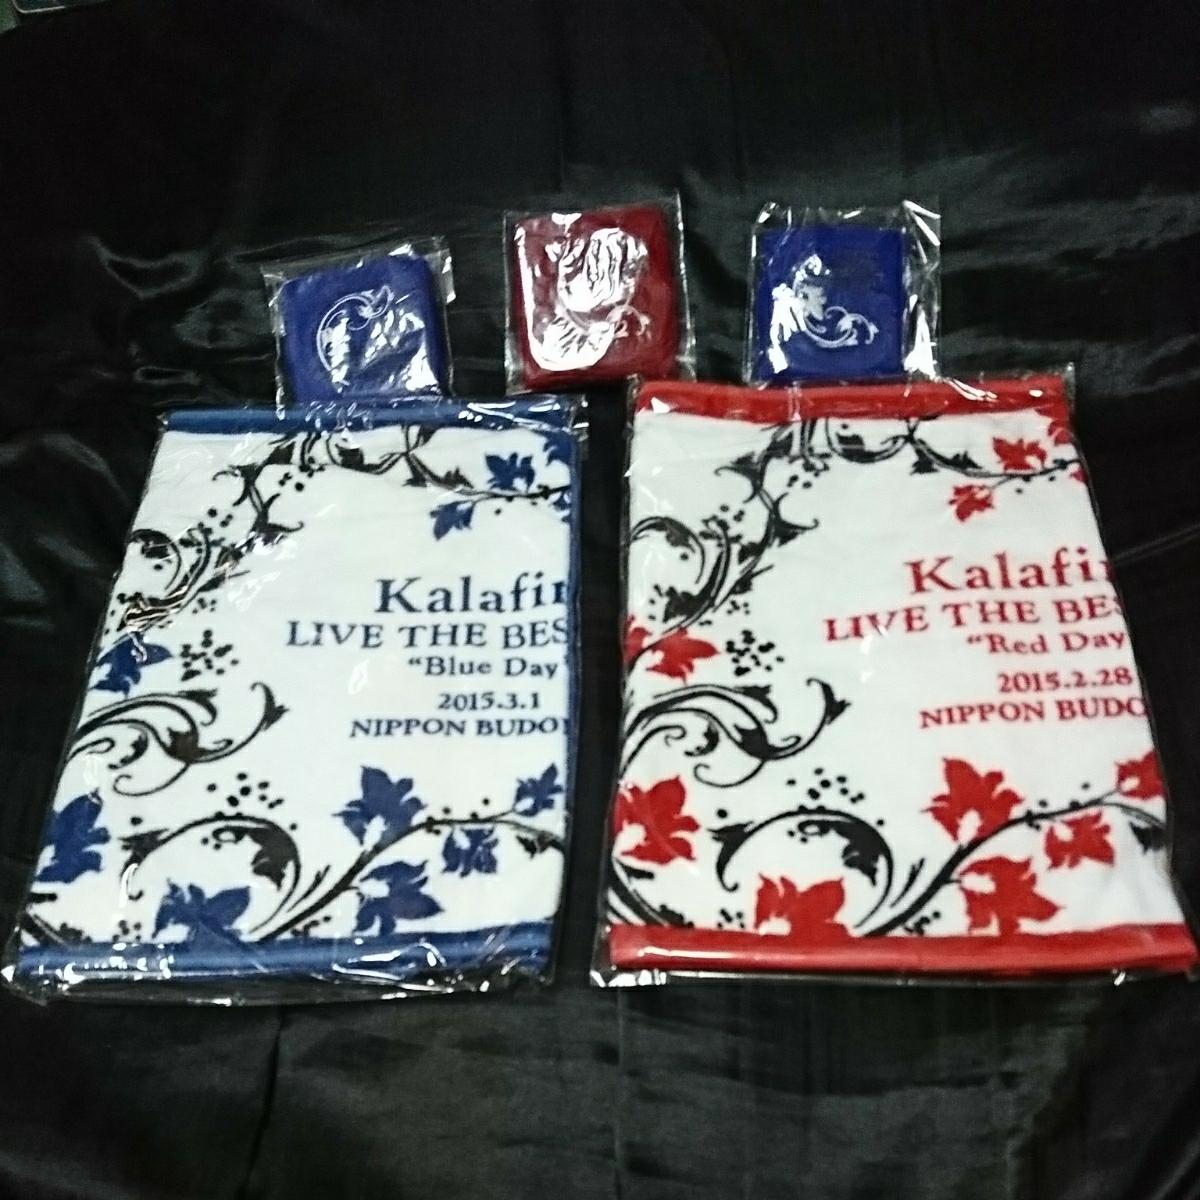 kalafina LIVE THE BEST 2015 Red Day & Blue Day フェイスタオル2種、リストバンド2種+おまけ (全て未開封)